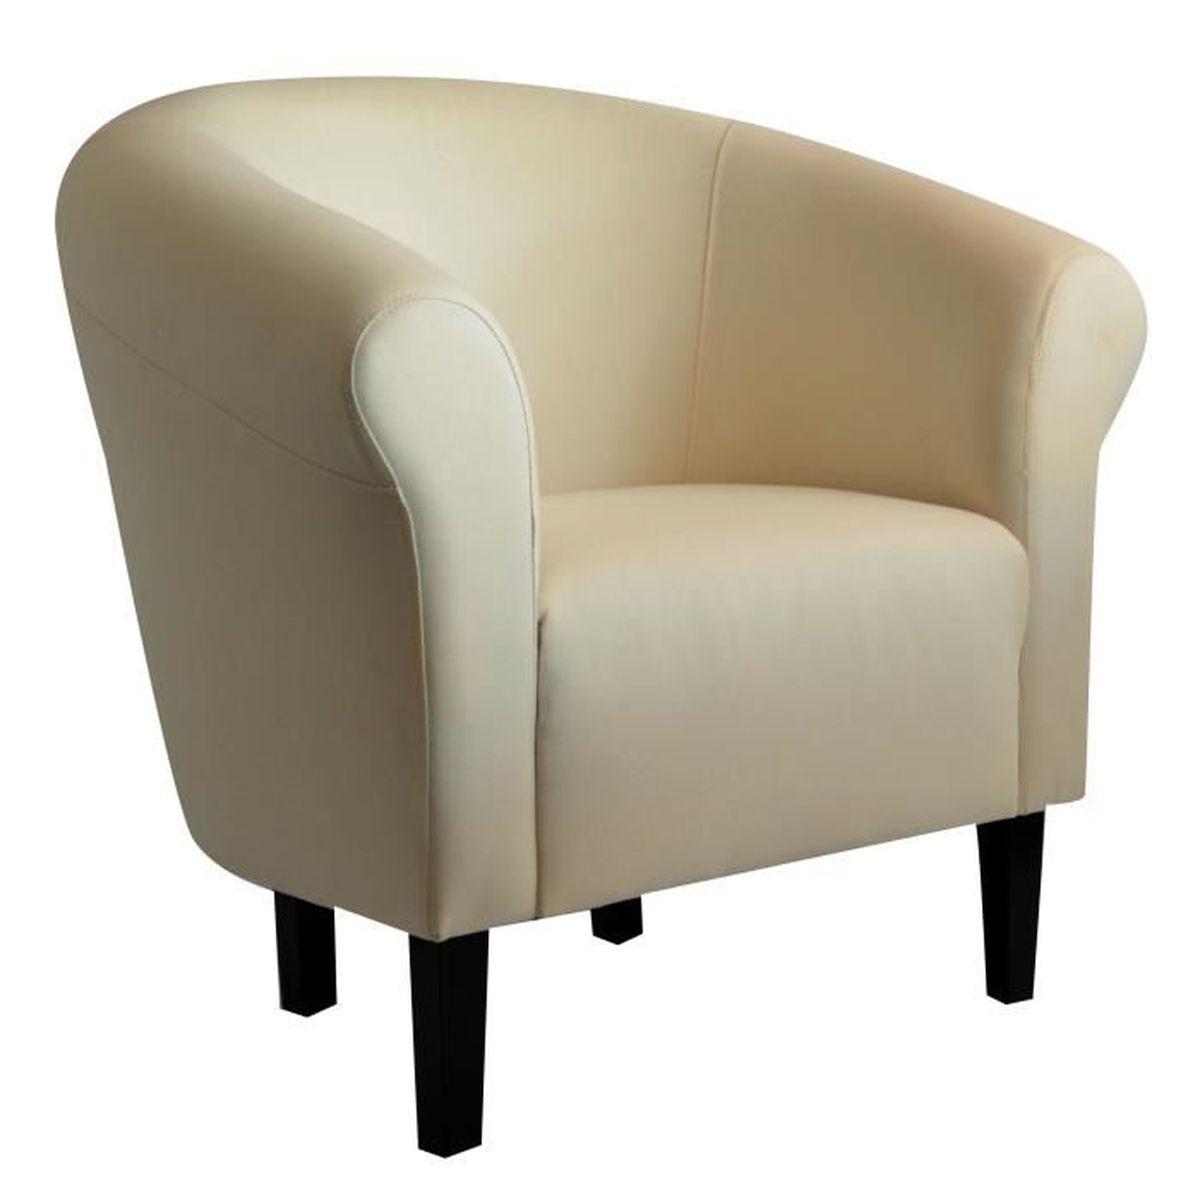 fauteuil crapaud monaco savane beige chin achat vente fauteuil cdiscount. Black Bedroom Furniture Sets. Home Design Ideas